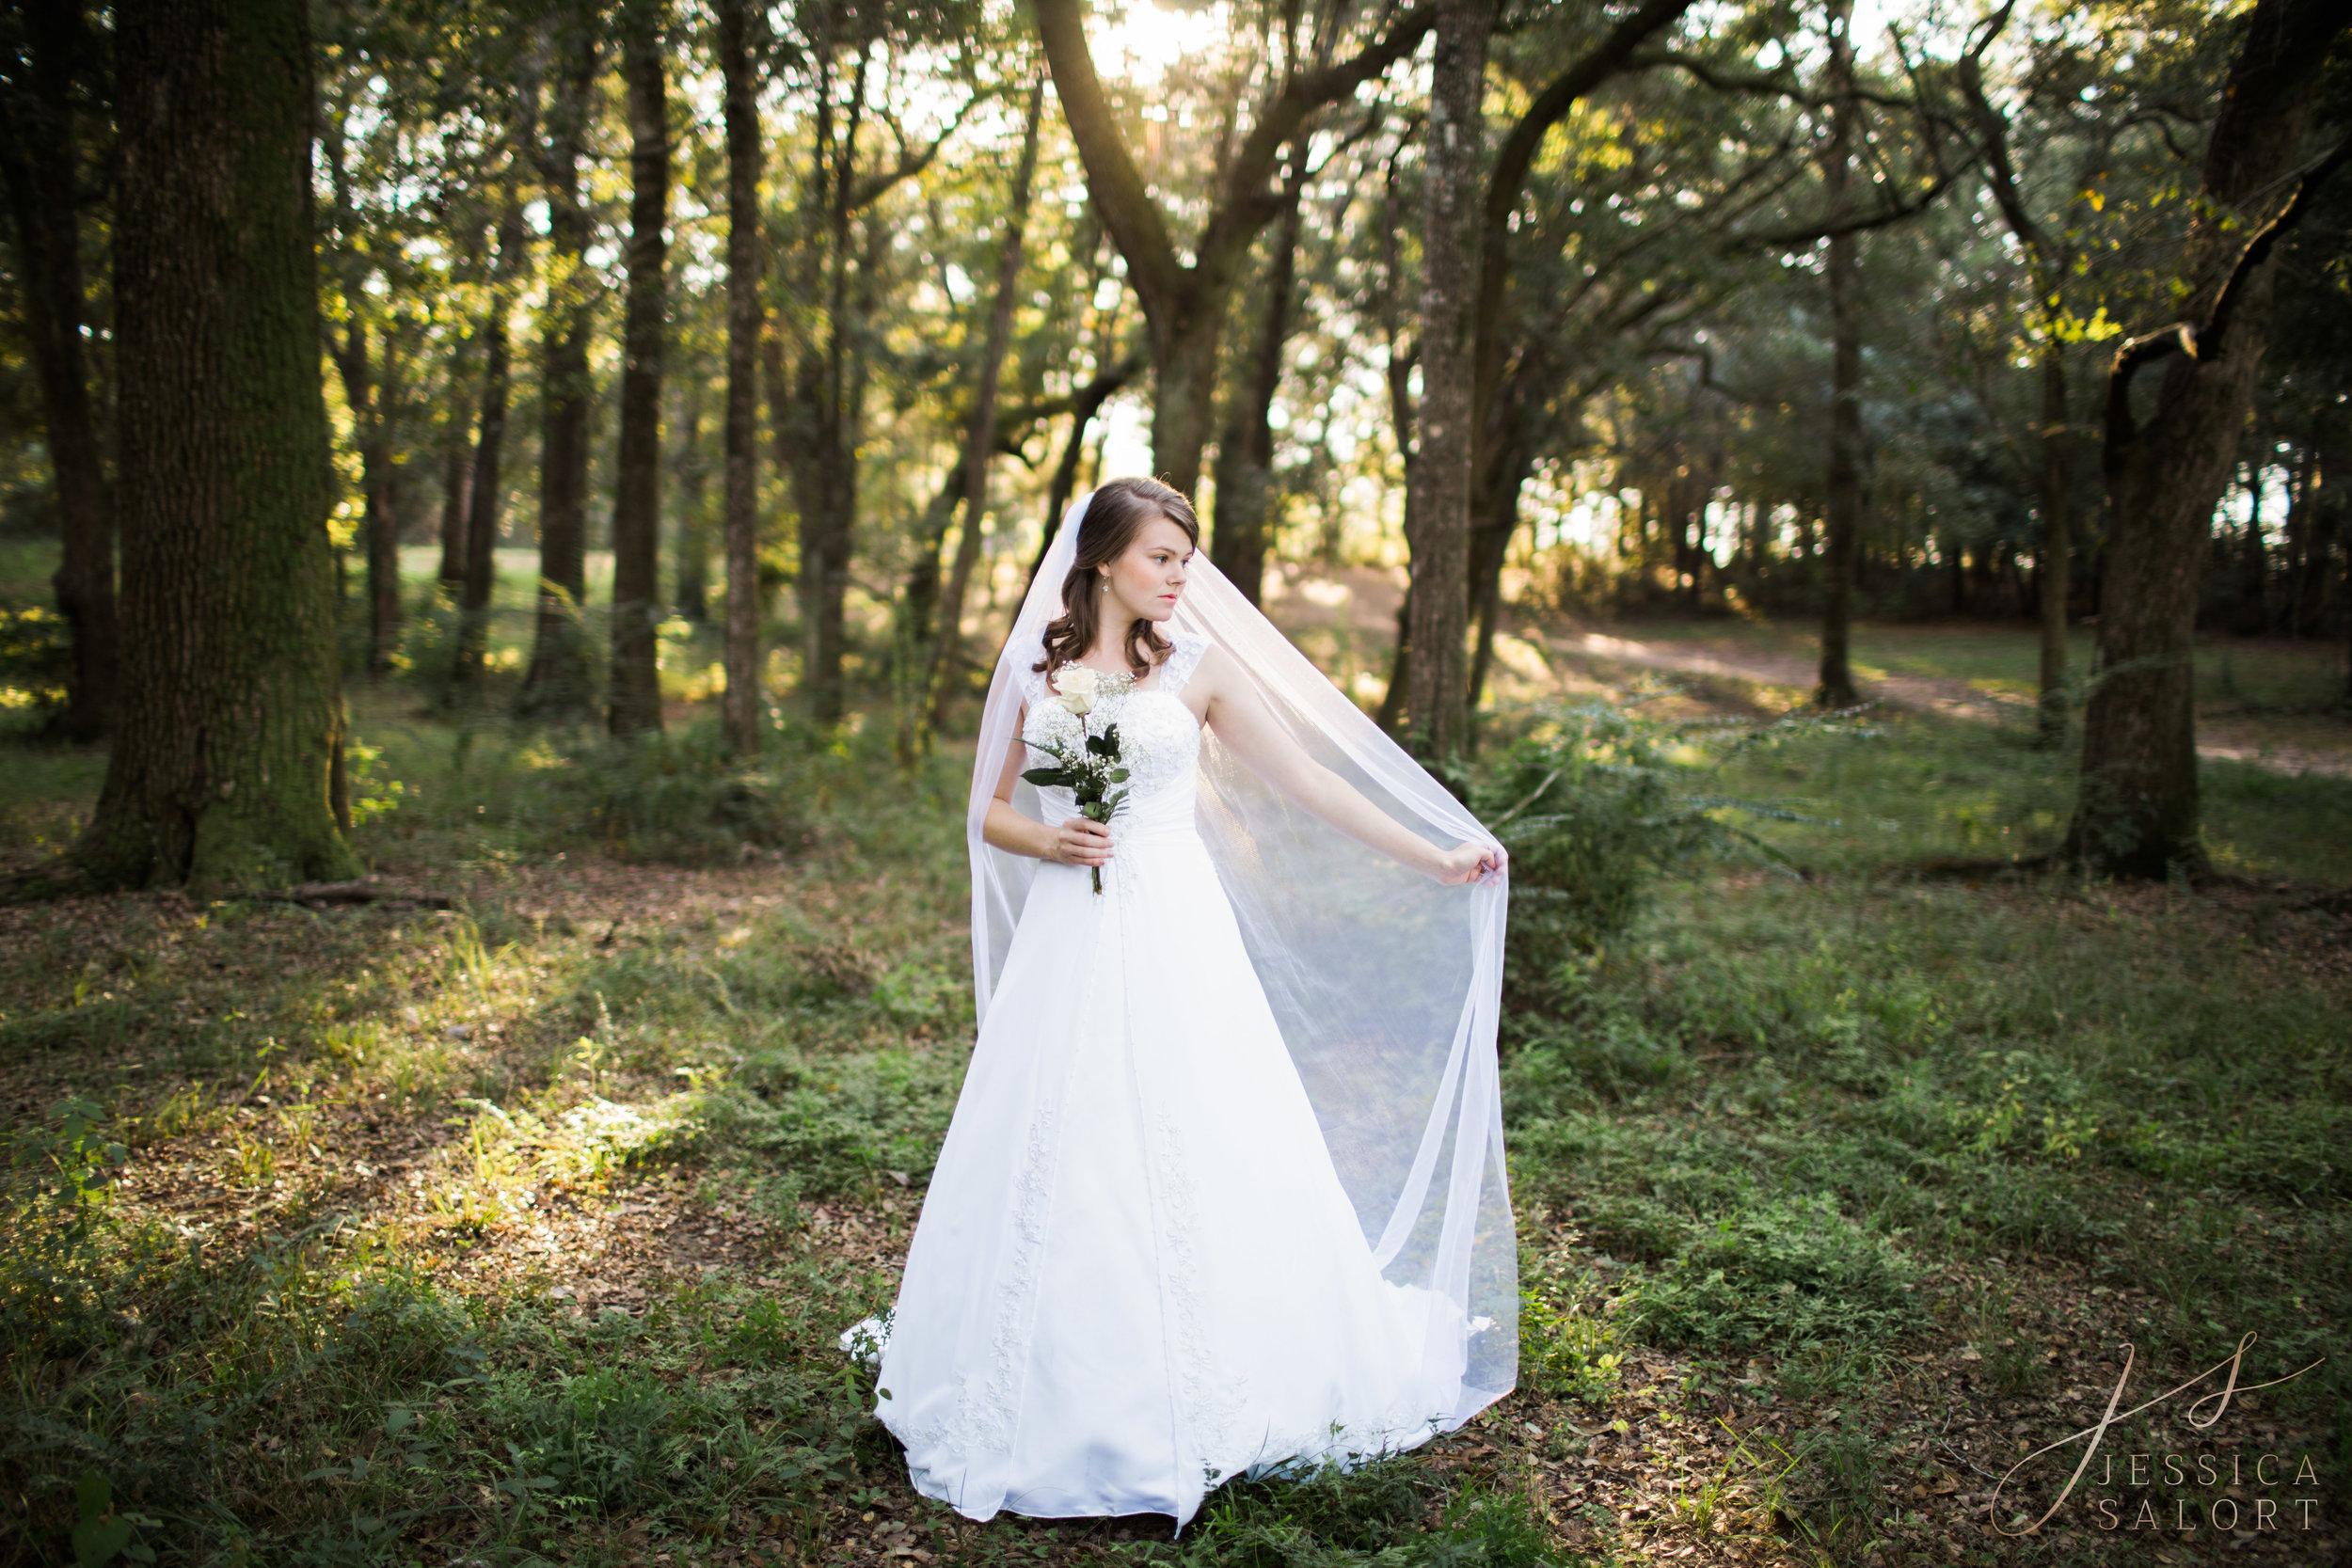 Jessica Salort, Gulf Coast Wedding Photographer